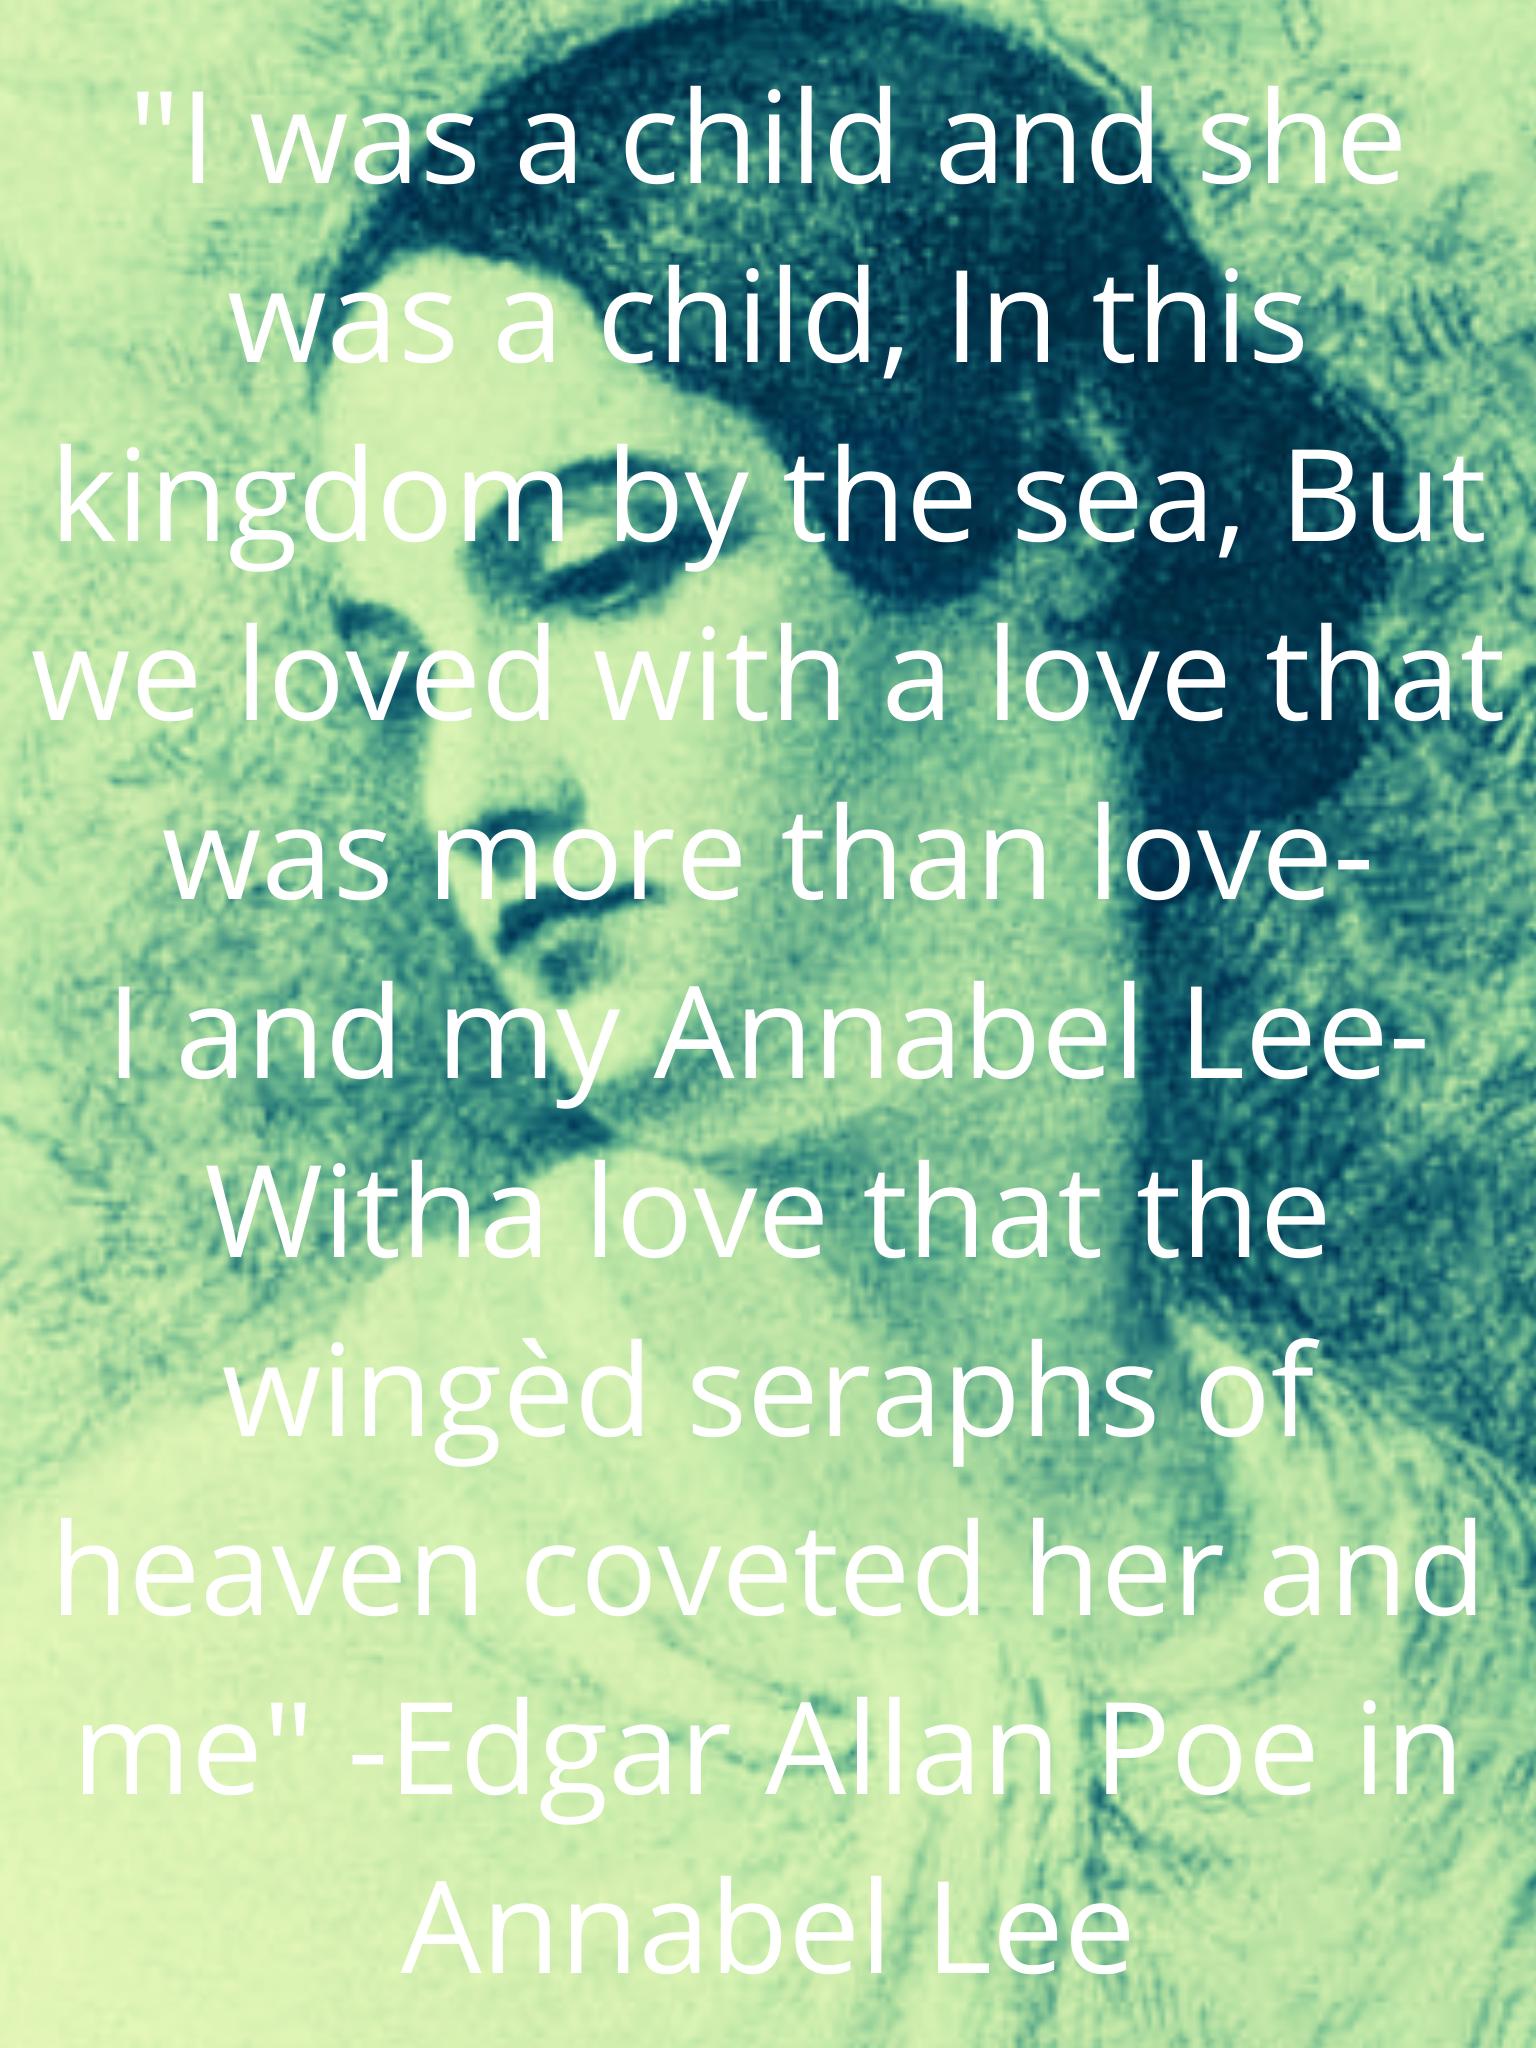 "«Qfiannabel'ej WIch lothhat' l ' F ' winged seraph: 40' heaven coveted heF angl me"" -Edgar Allan fee in Annabel Lee"" ' ""I. . Li"" https://inspirational.ly"